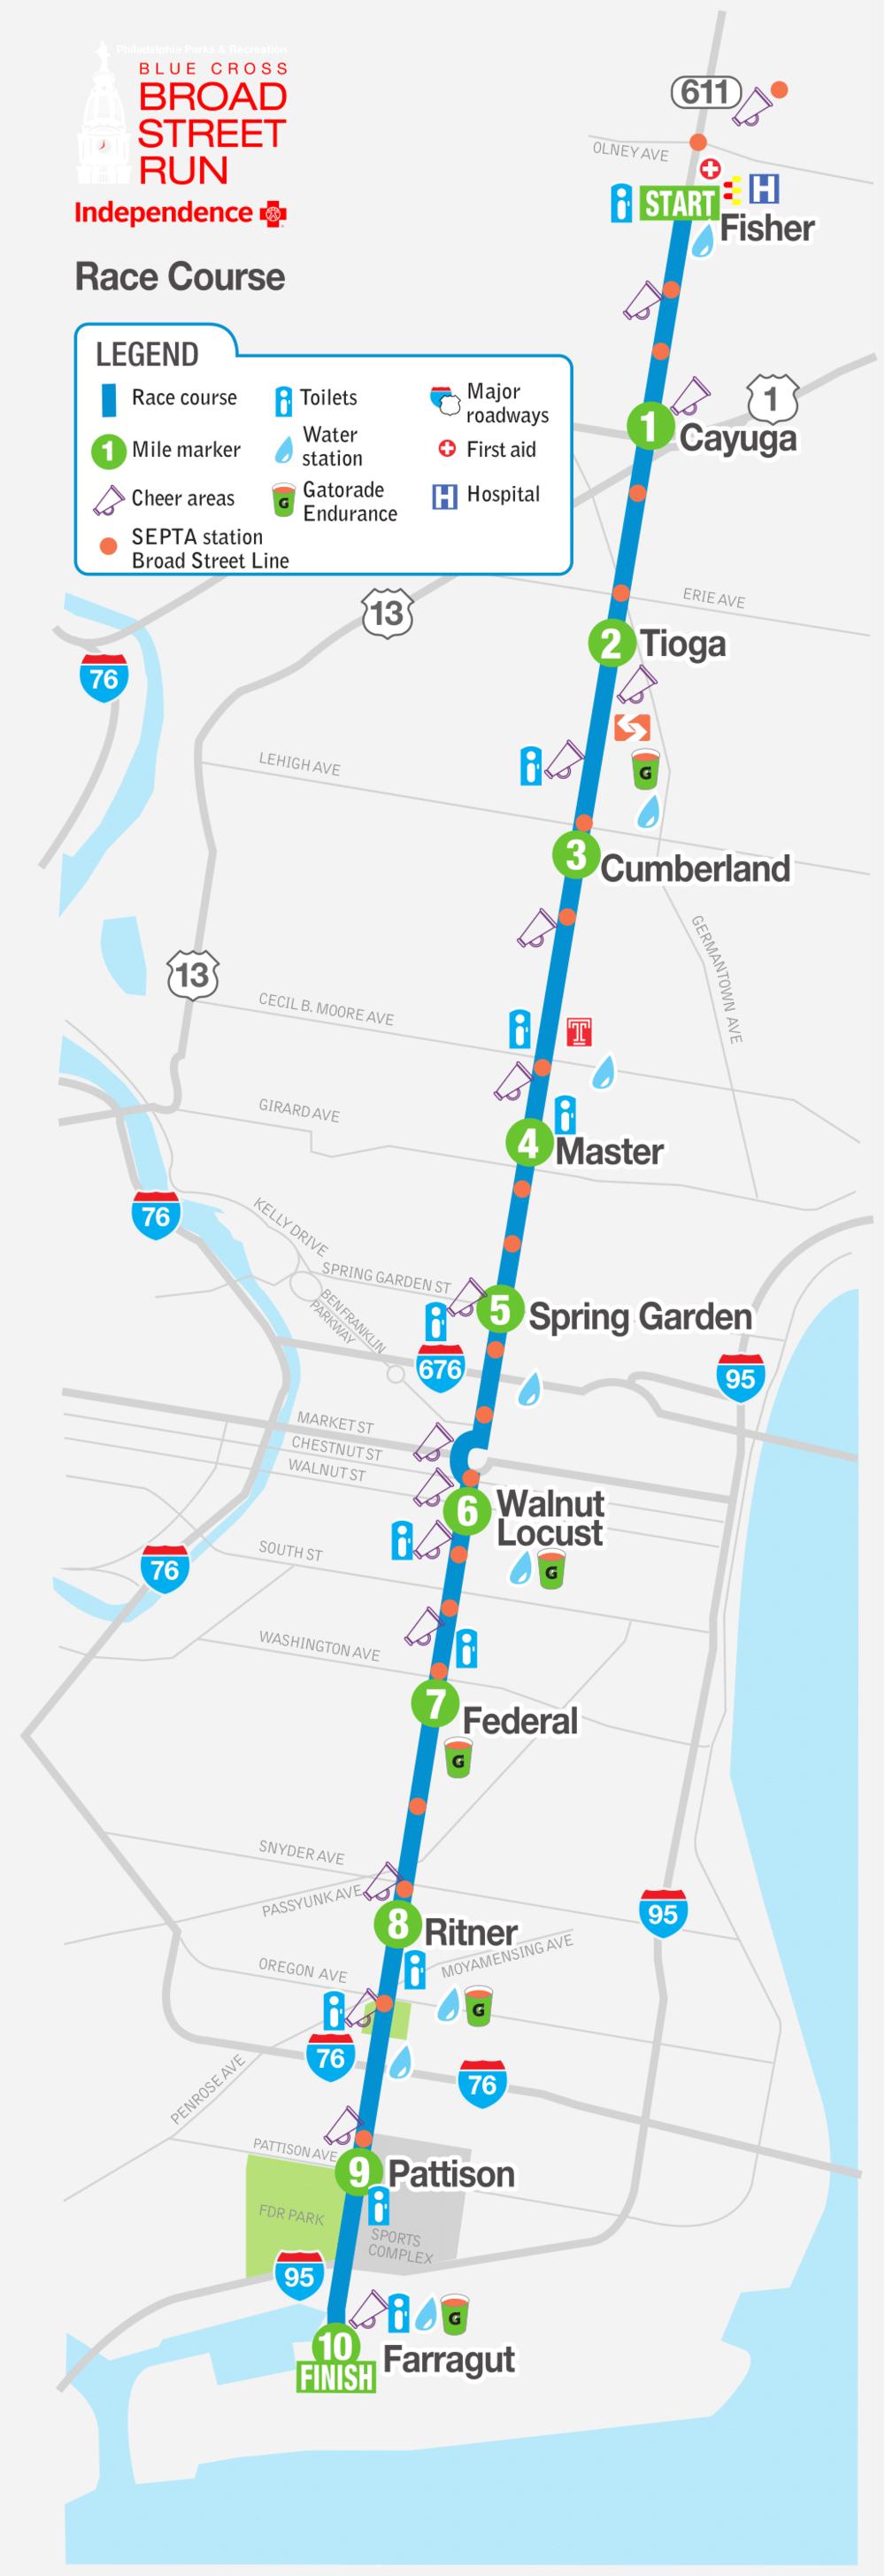 Broad Street Run Course via Broad Street Run